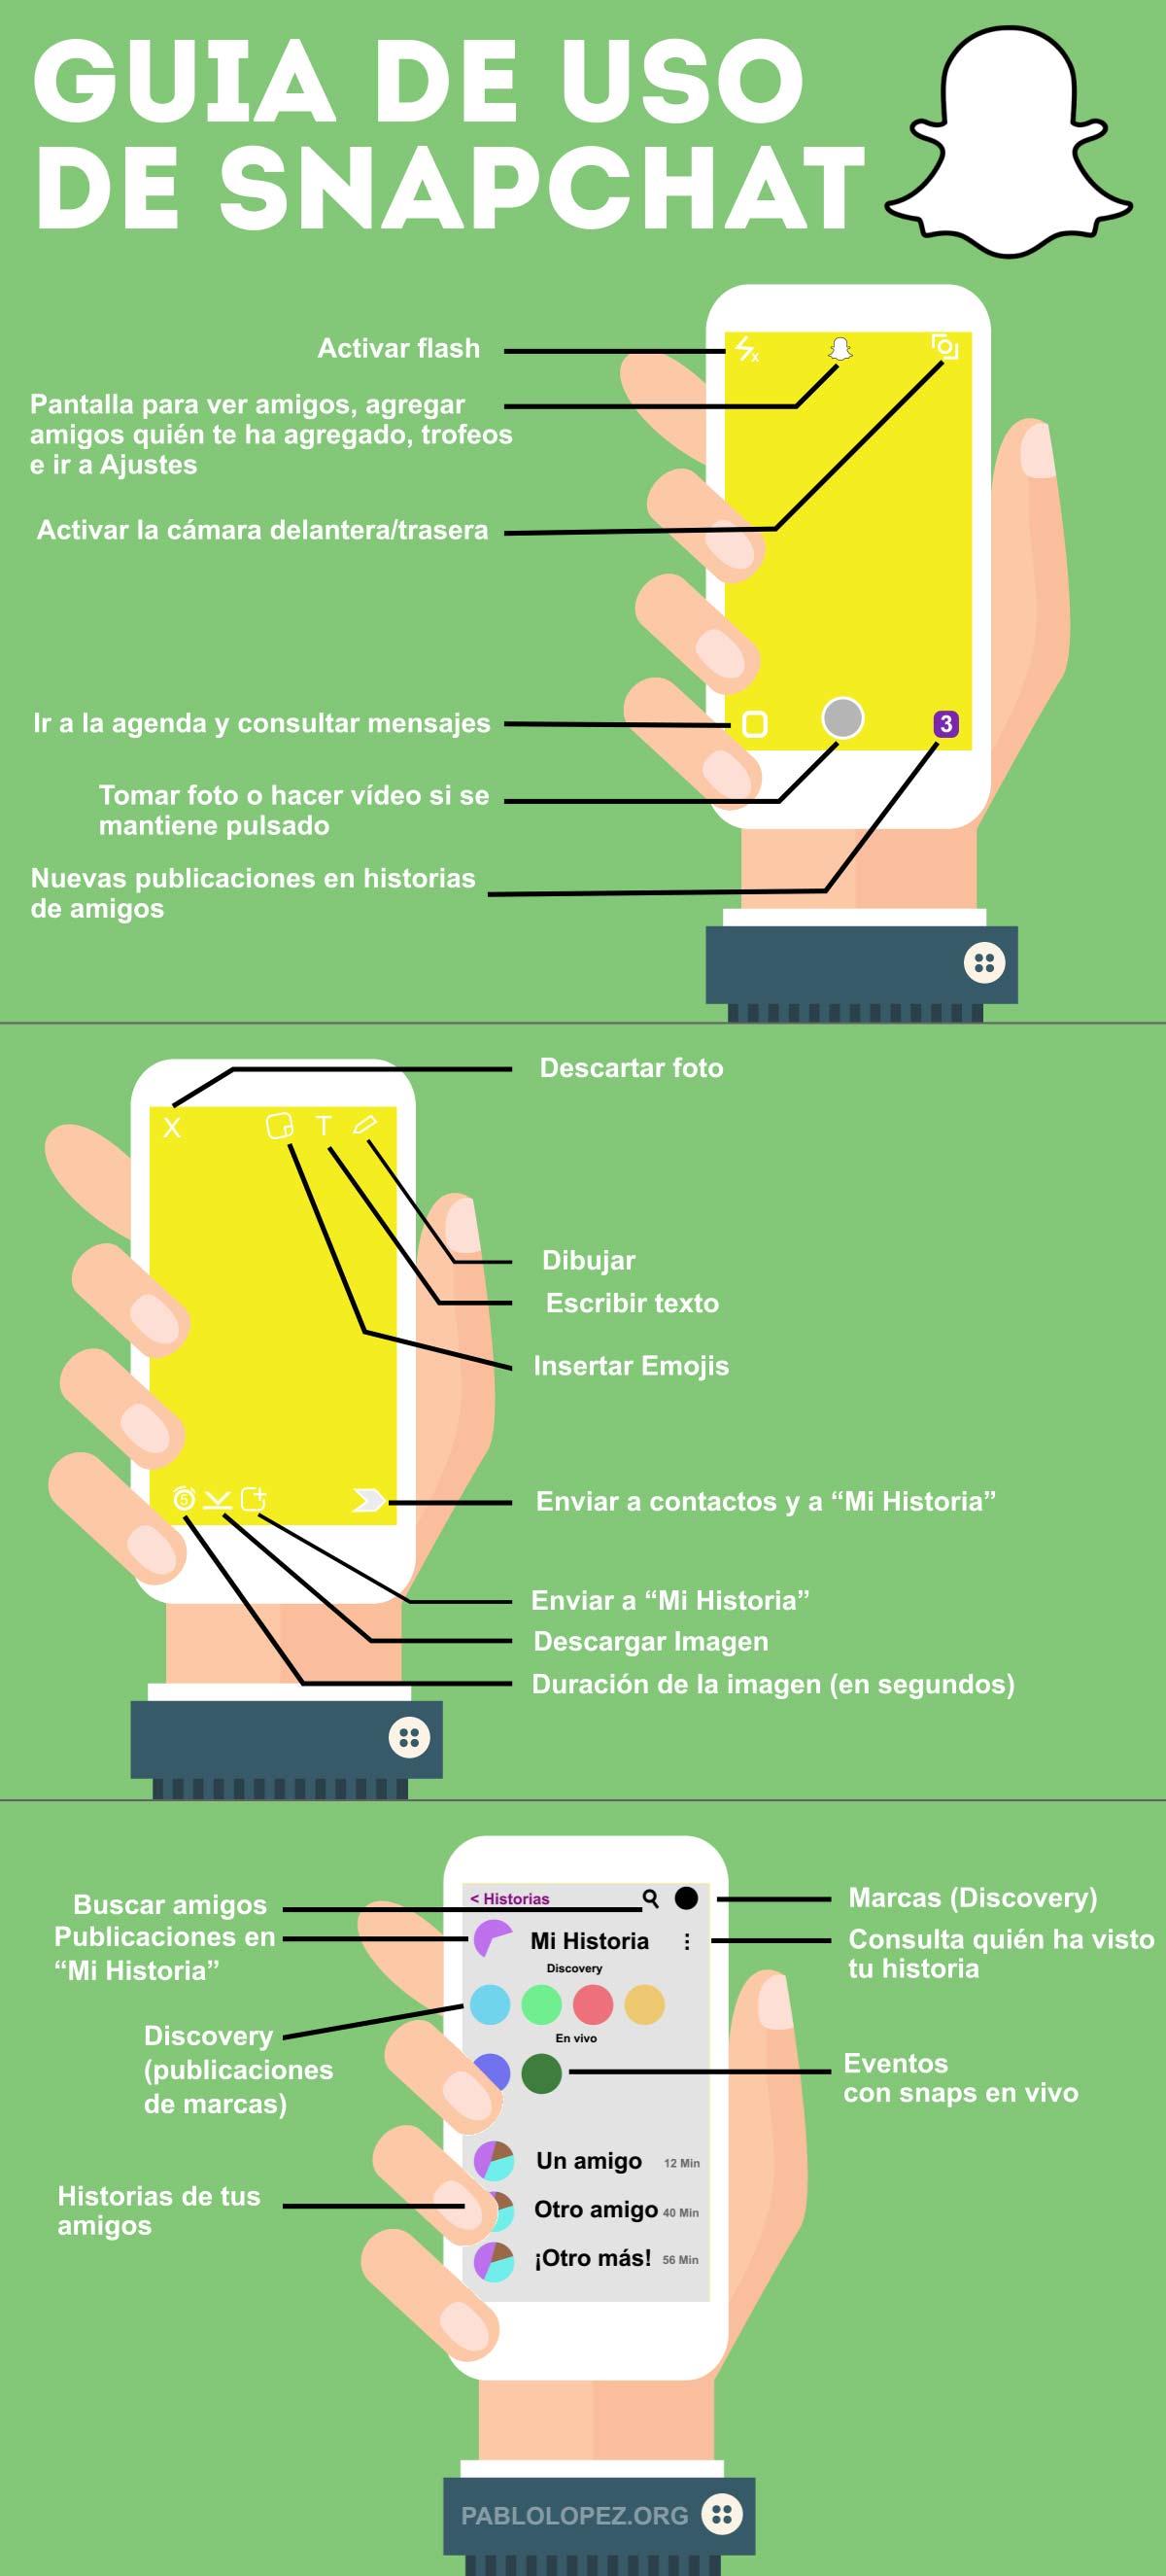 Infográfico sobre cómo usar snapchat.